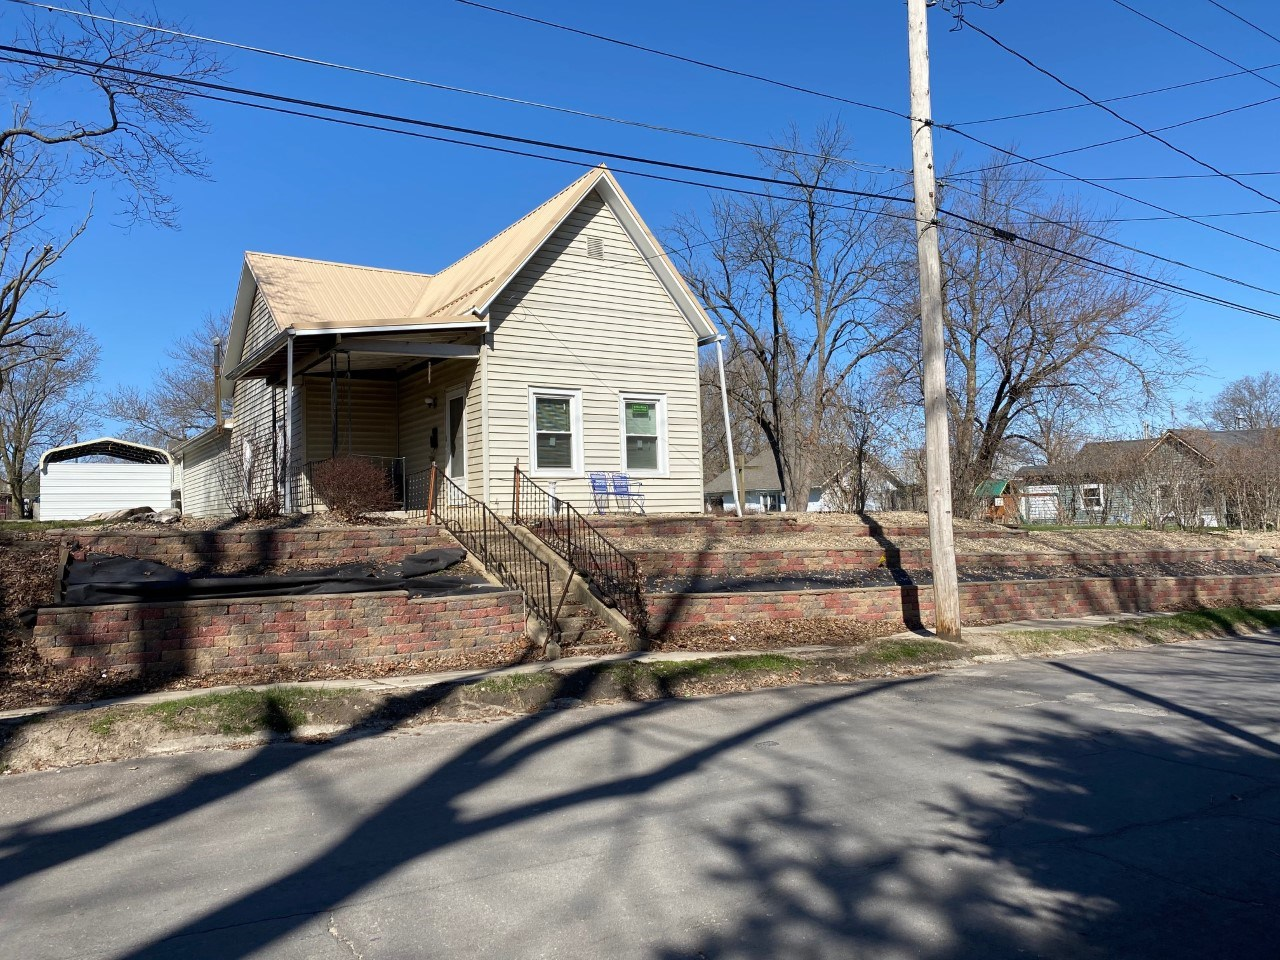 2 Bedroom, 1 Bath Home For Sale Trenton, MO